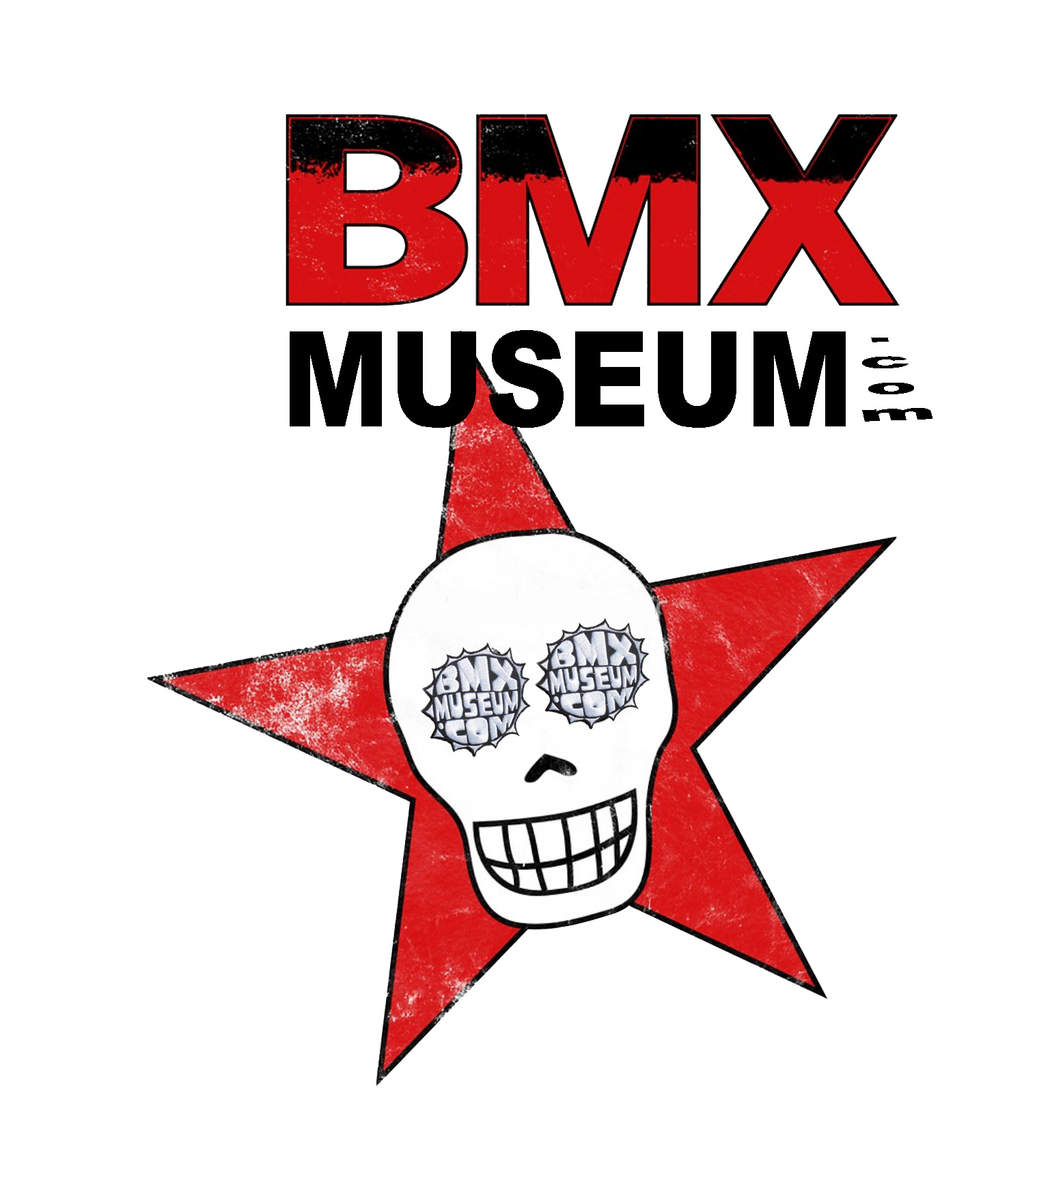 http://uploads.bmxmuseum.com/user-images/152/kurtshirteyes5d6bed7d4d.jpg